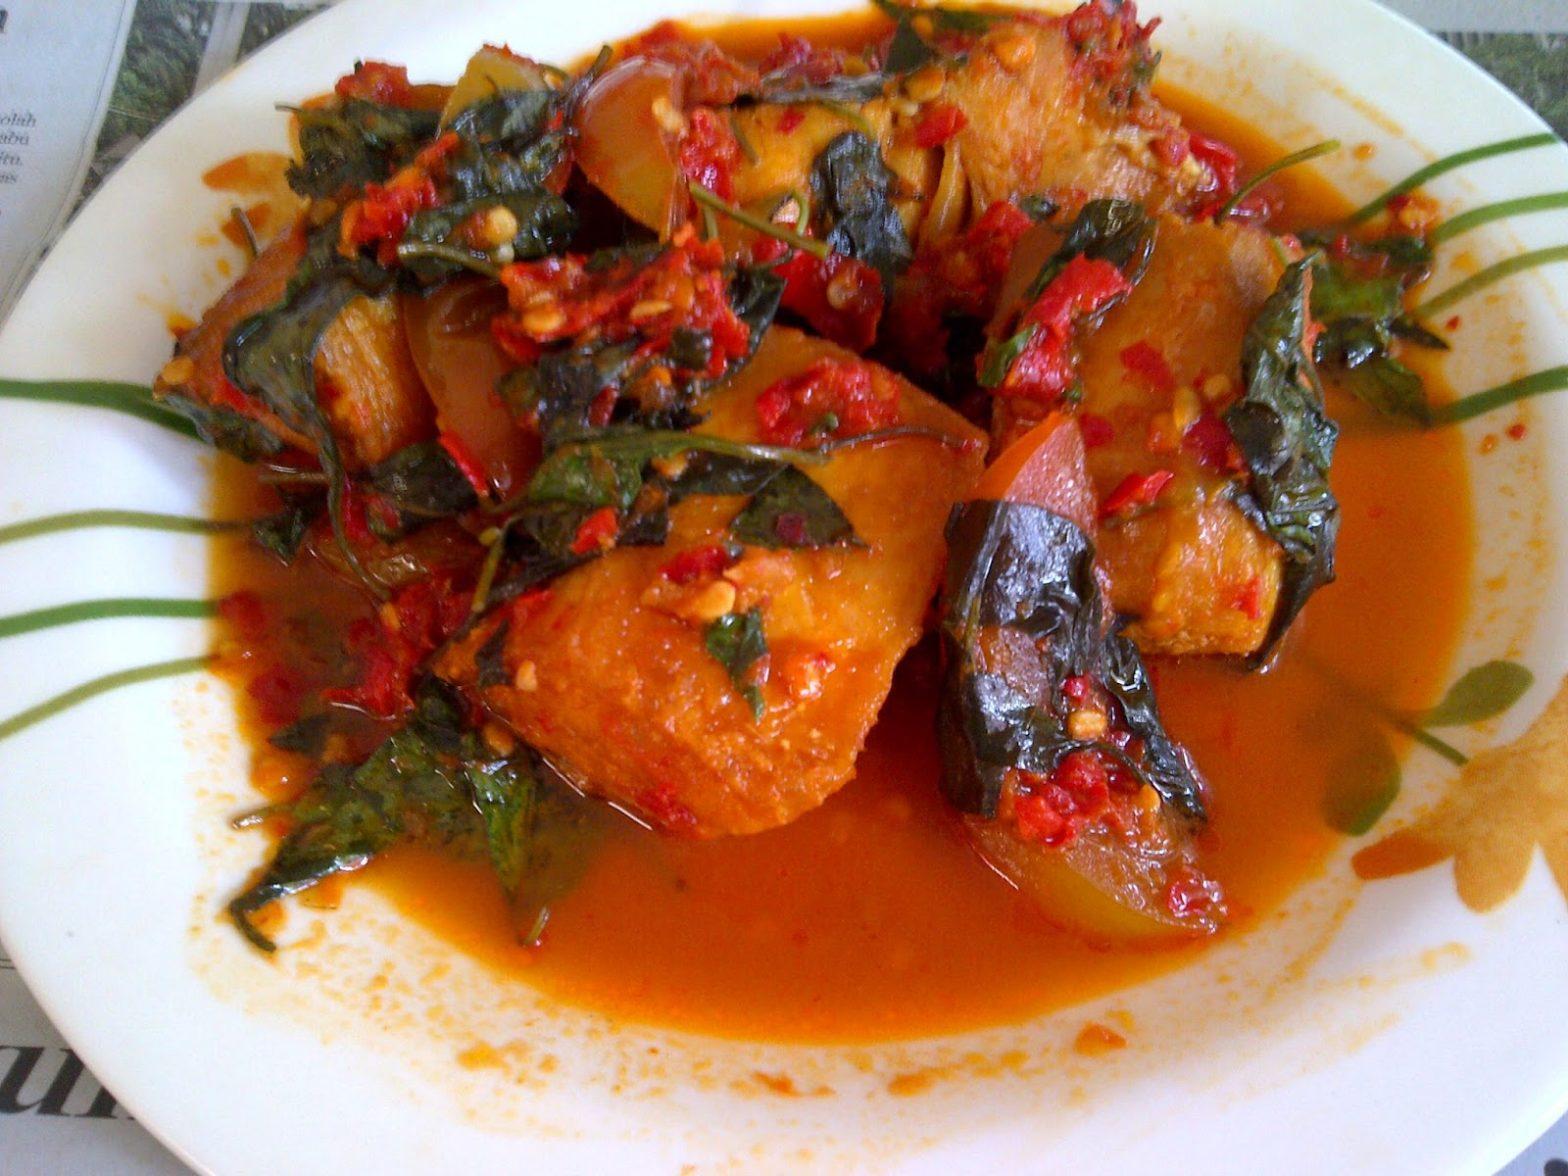 Resep masakan Ikan tuna rica-rica